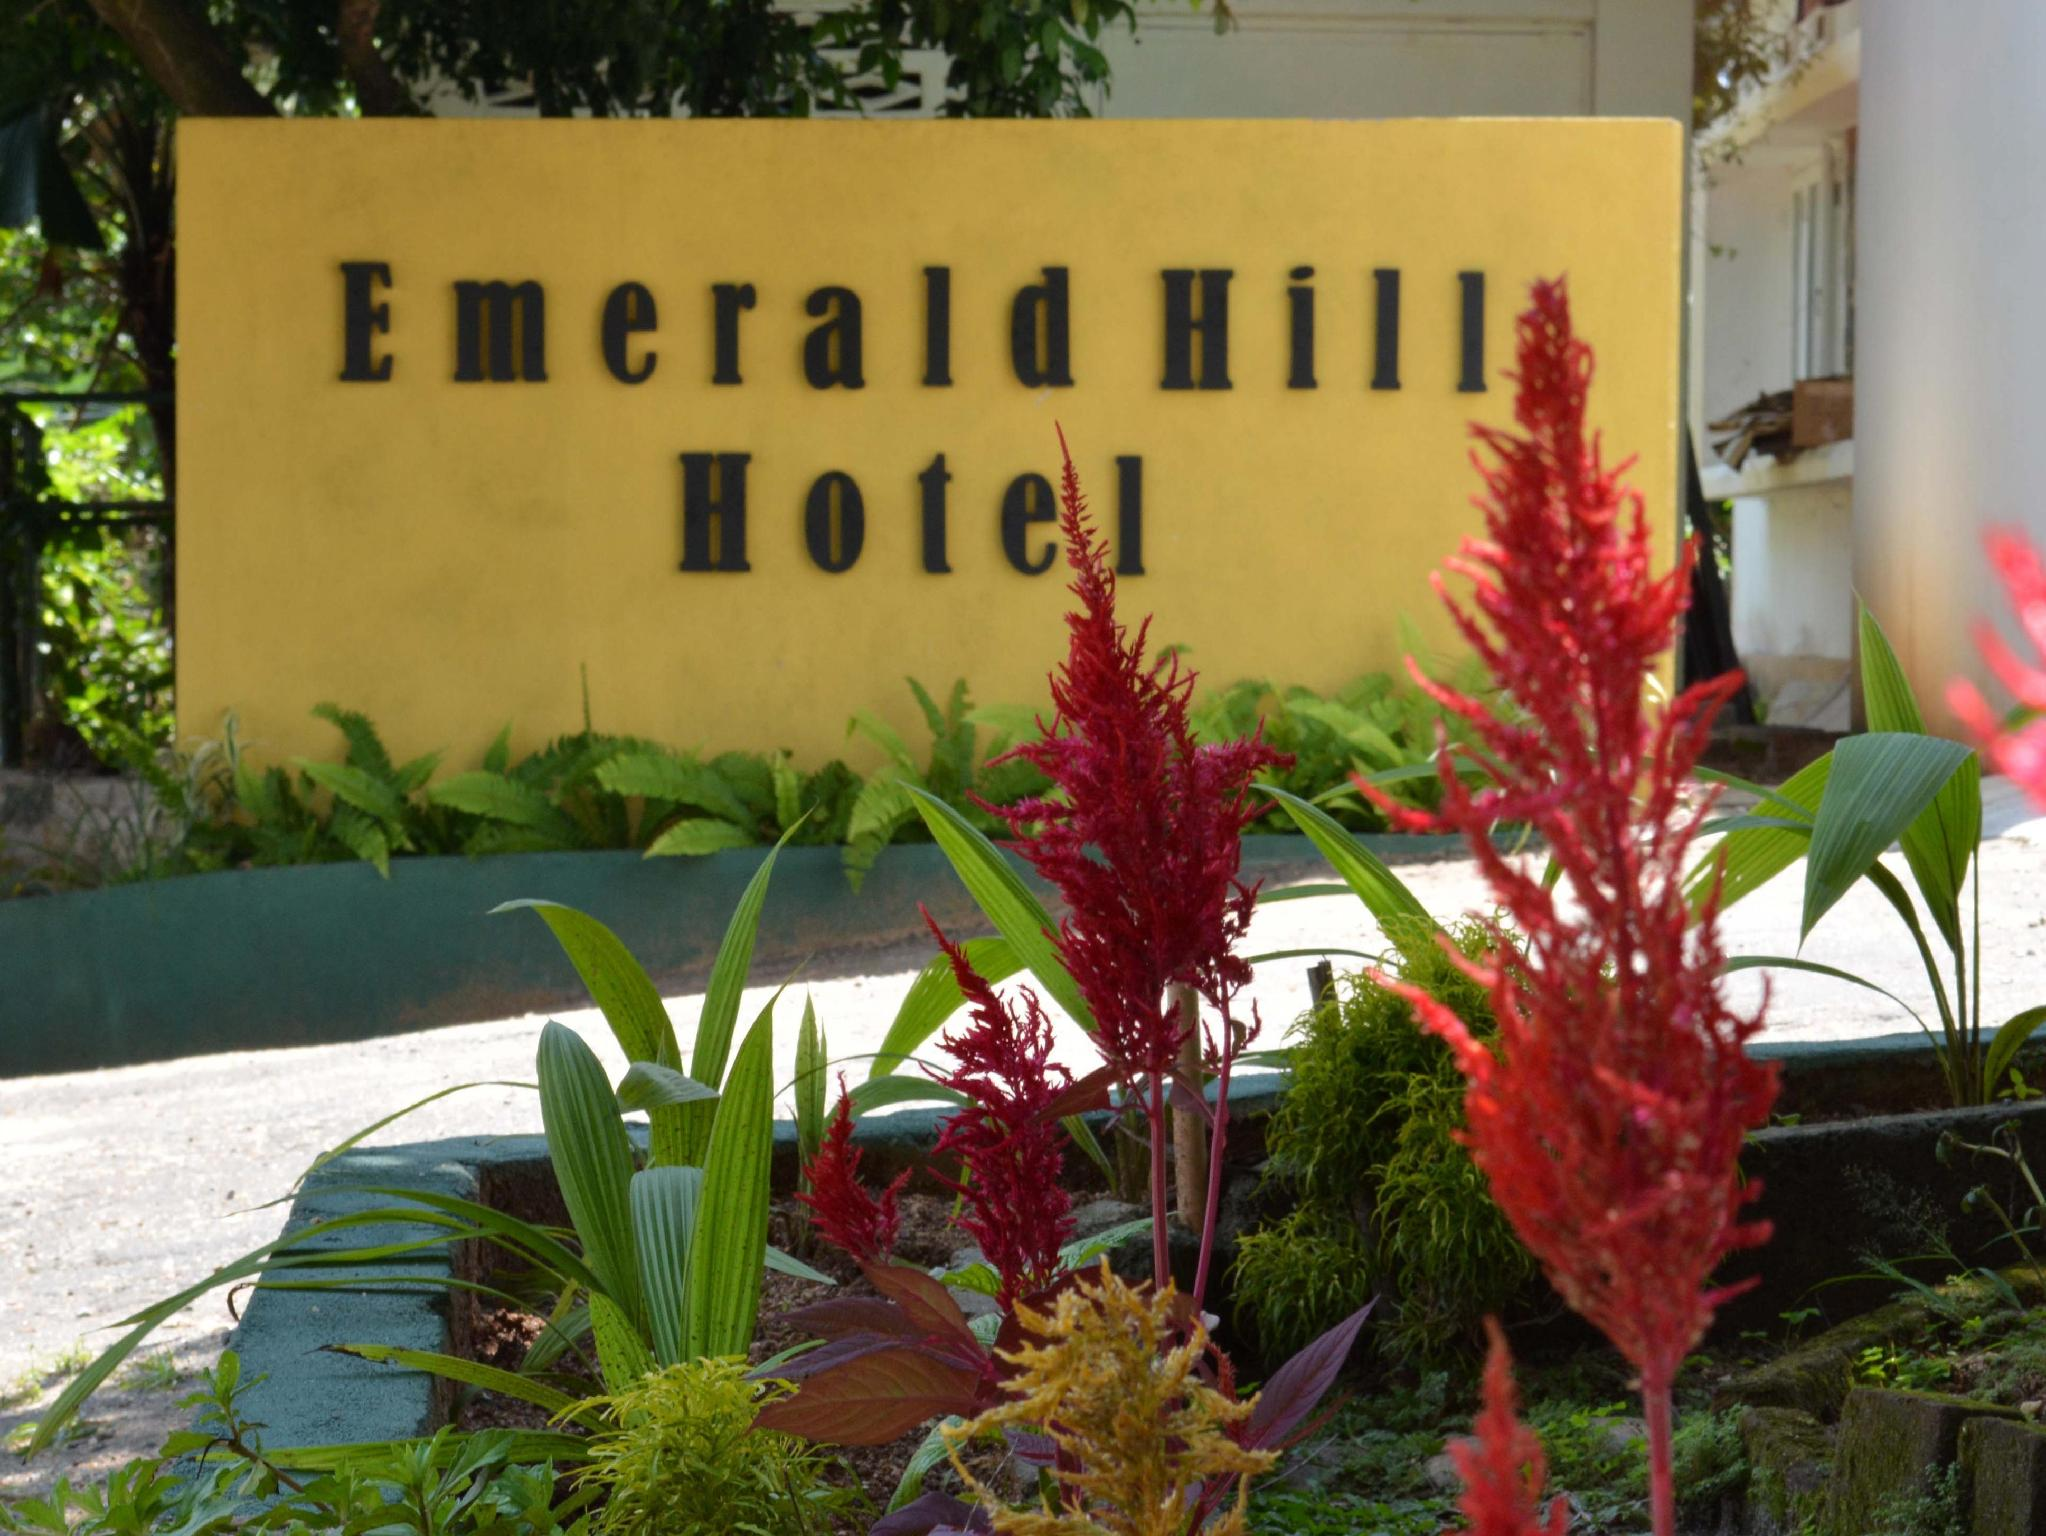 Emerald Hill Hotel